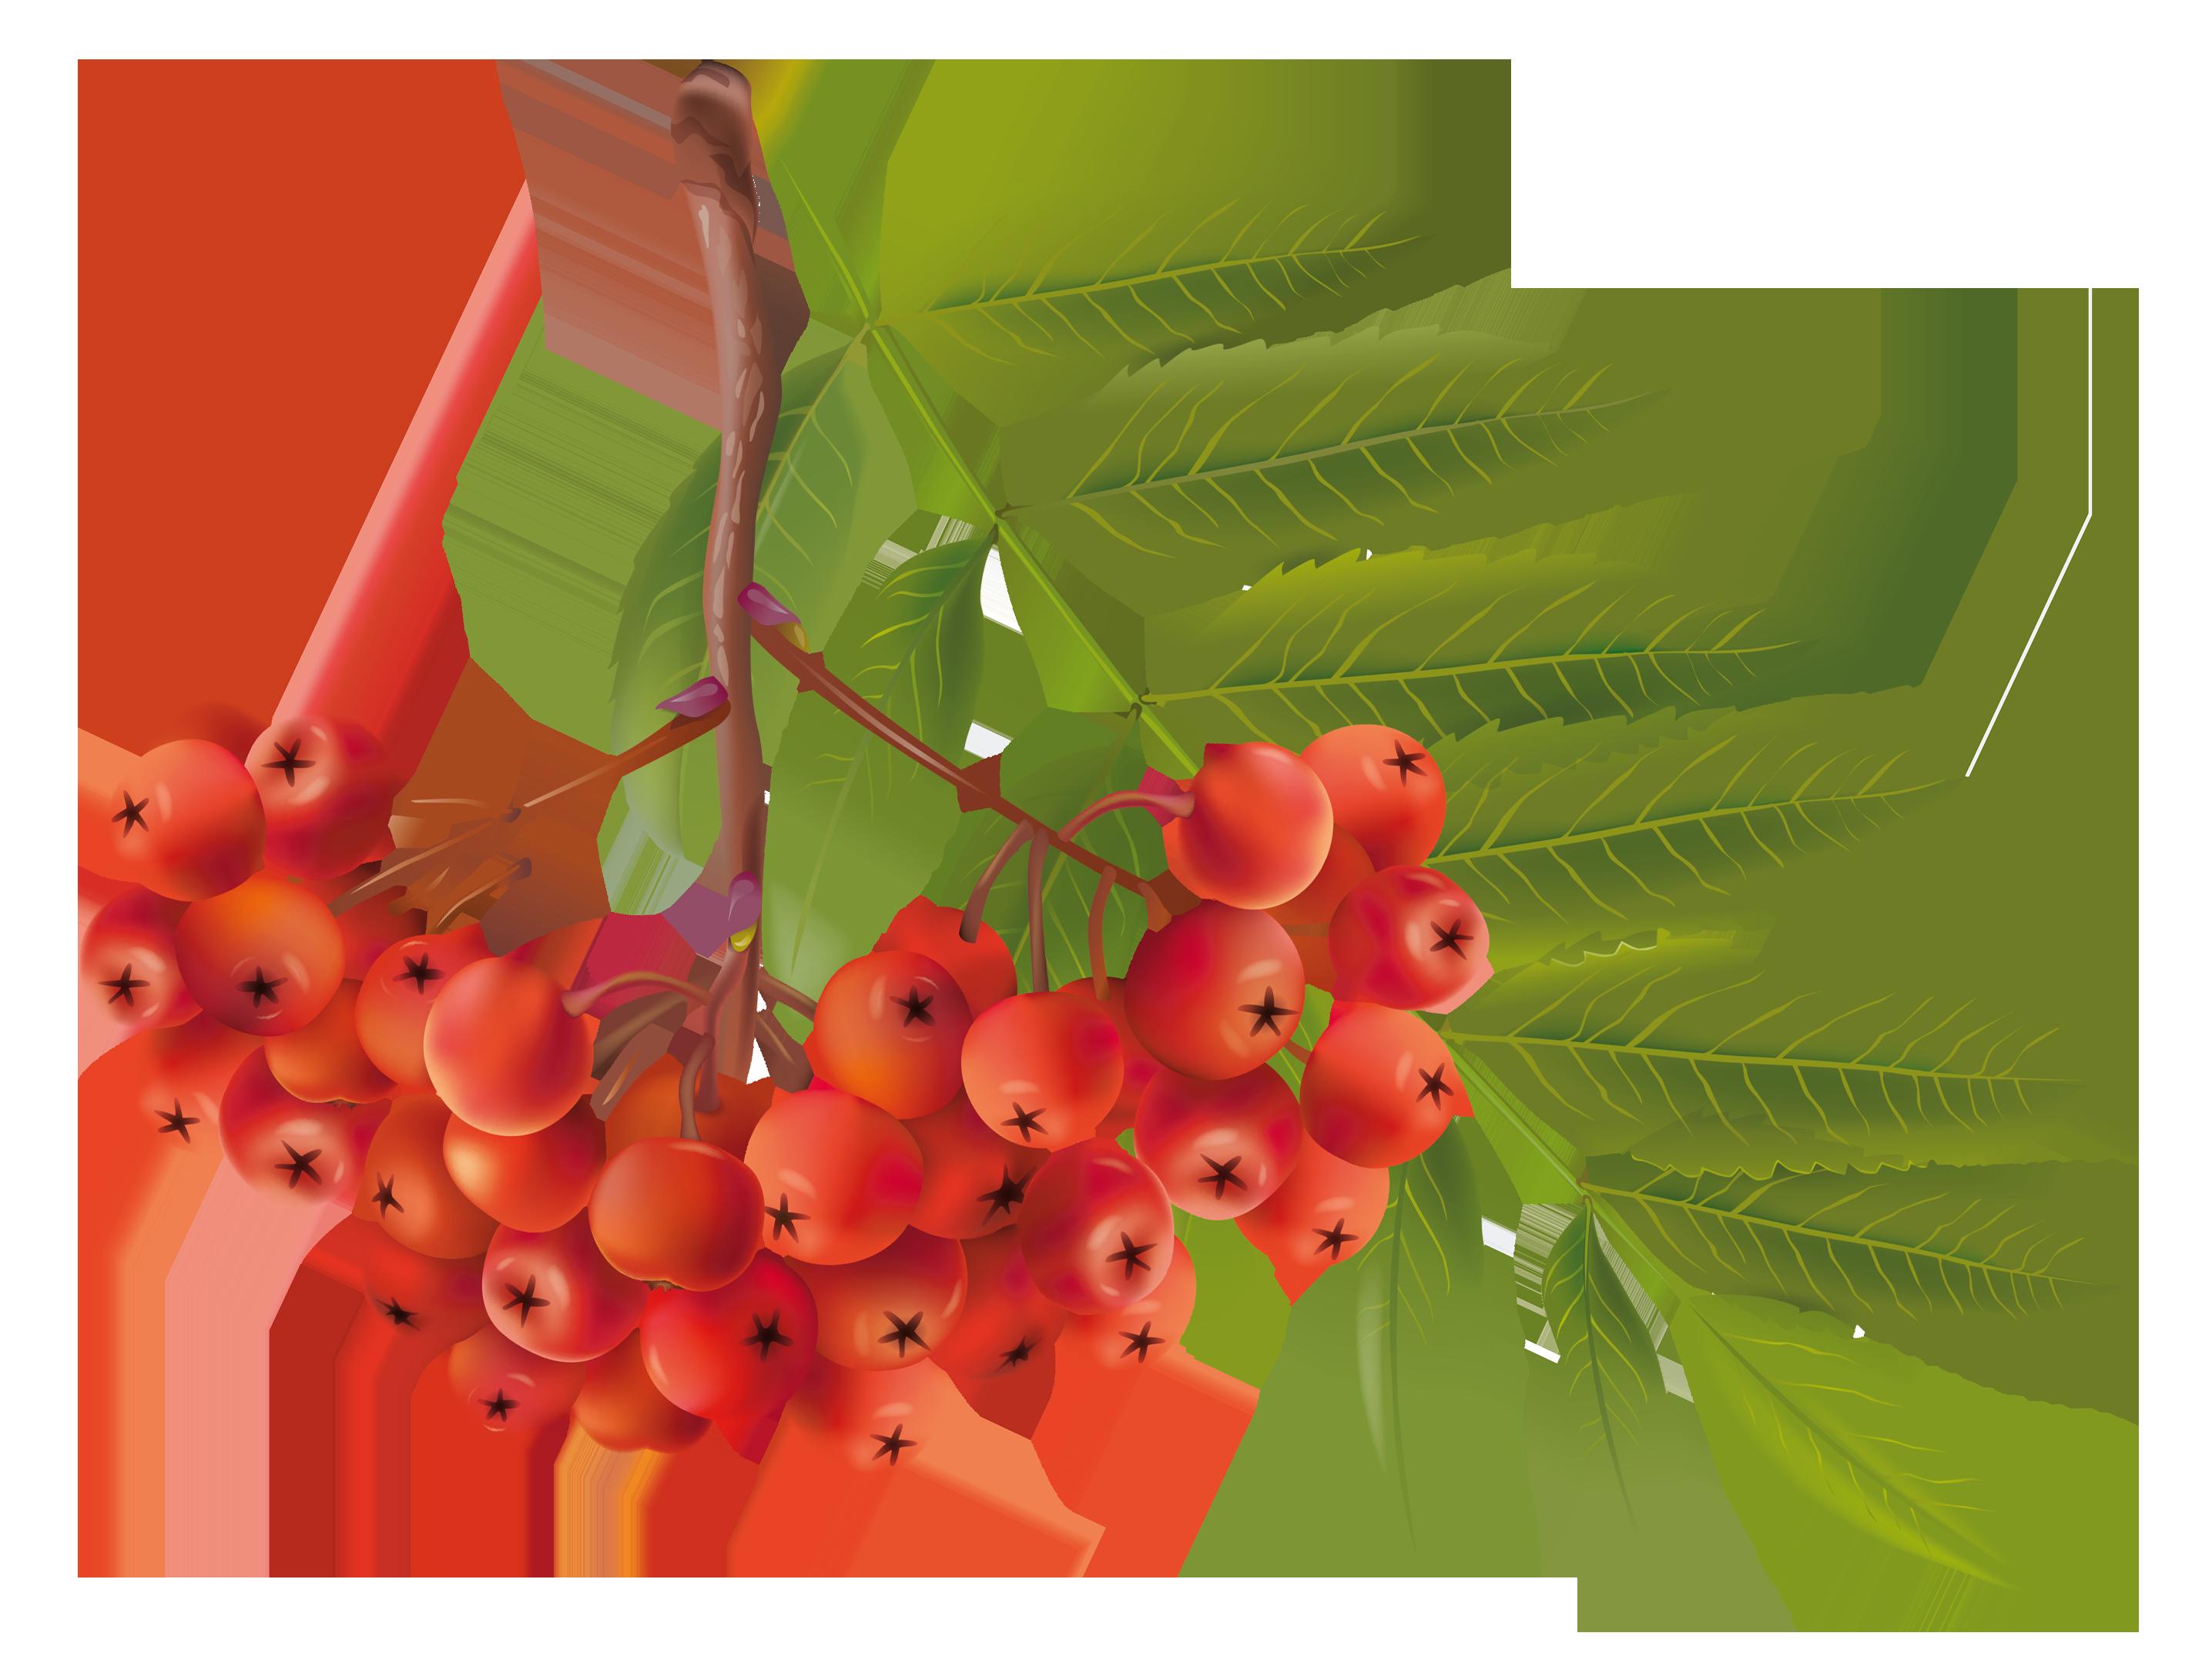 Autumn plant png image. Winter clipart berry